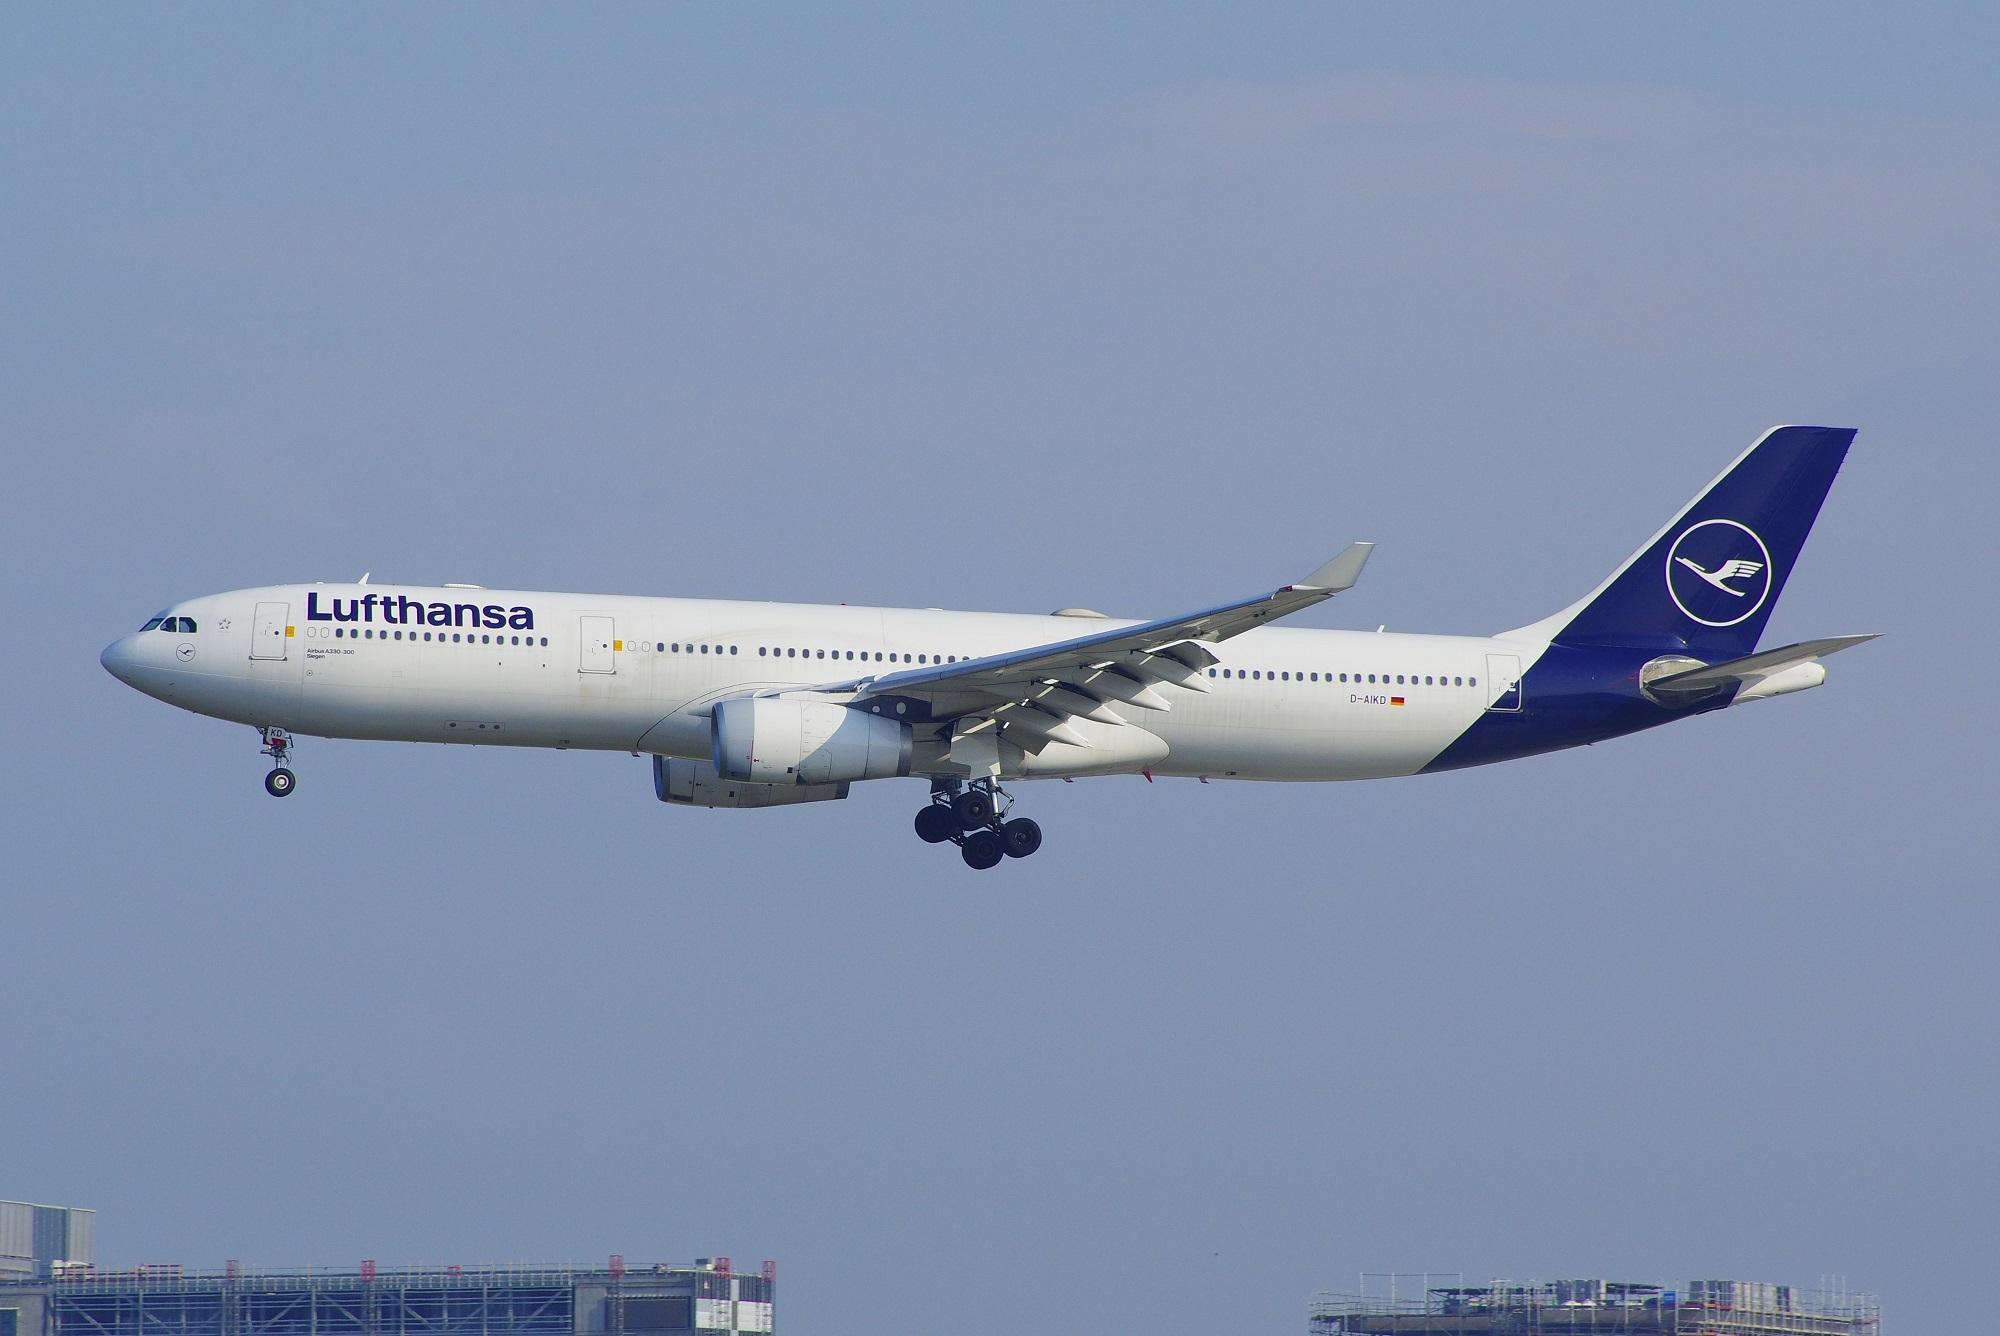 Lufthansa Airbus A330-300, MSN  - brummi | ello